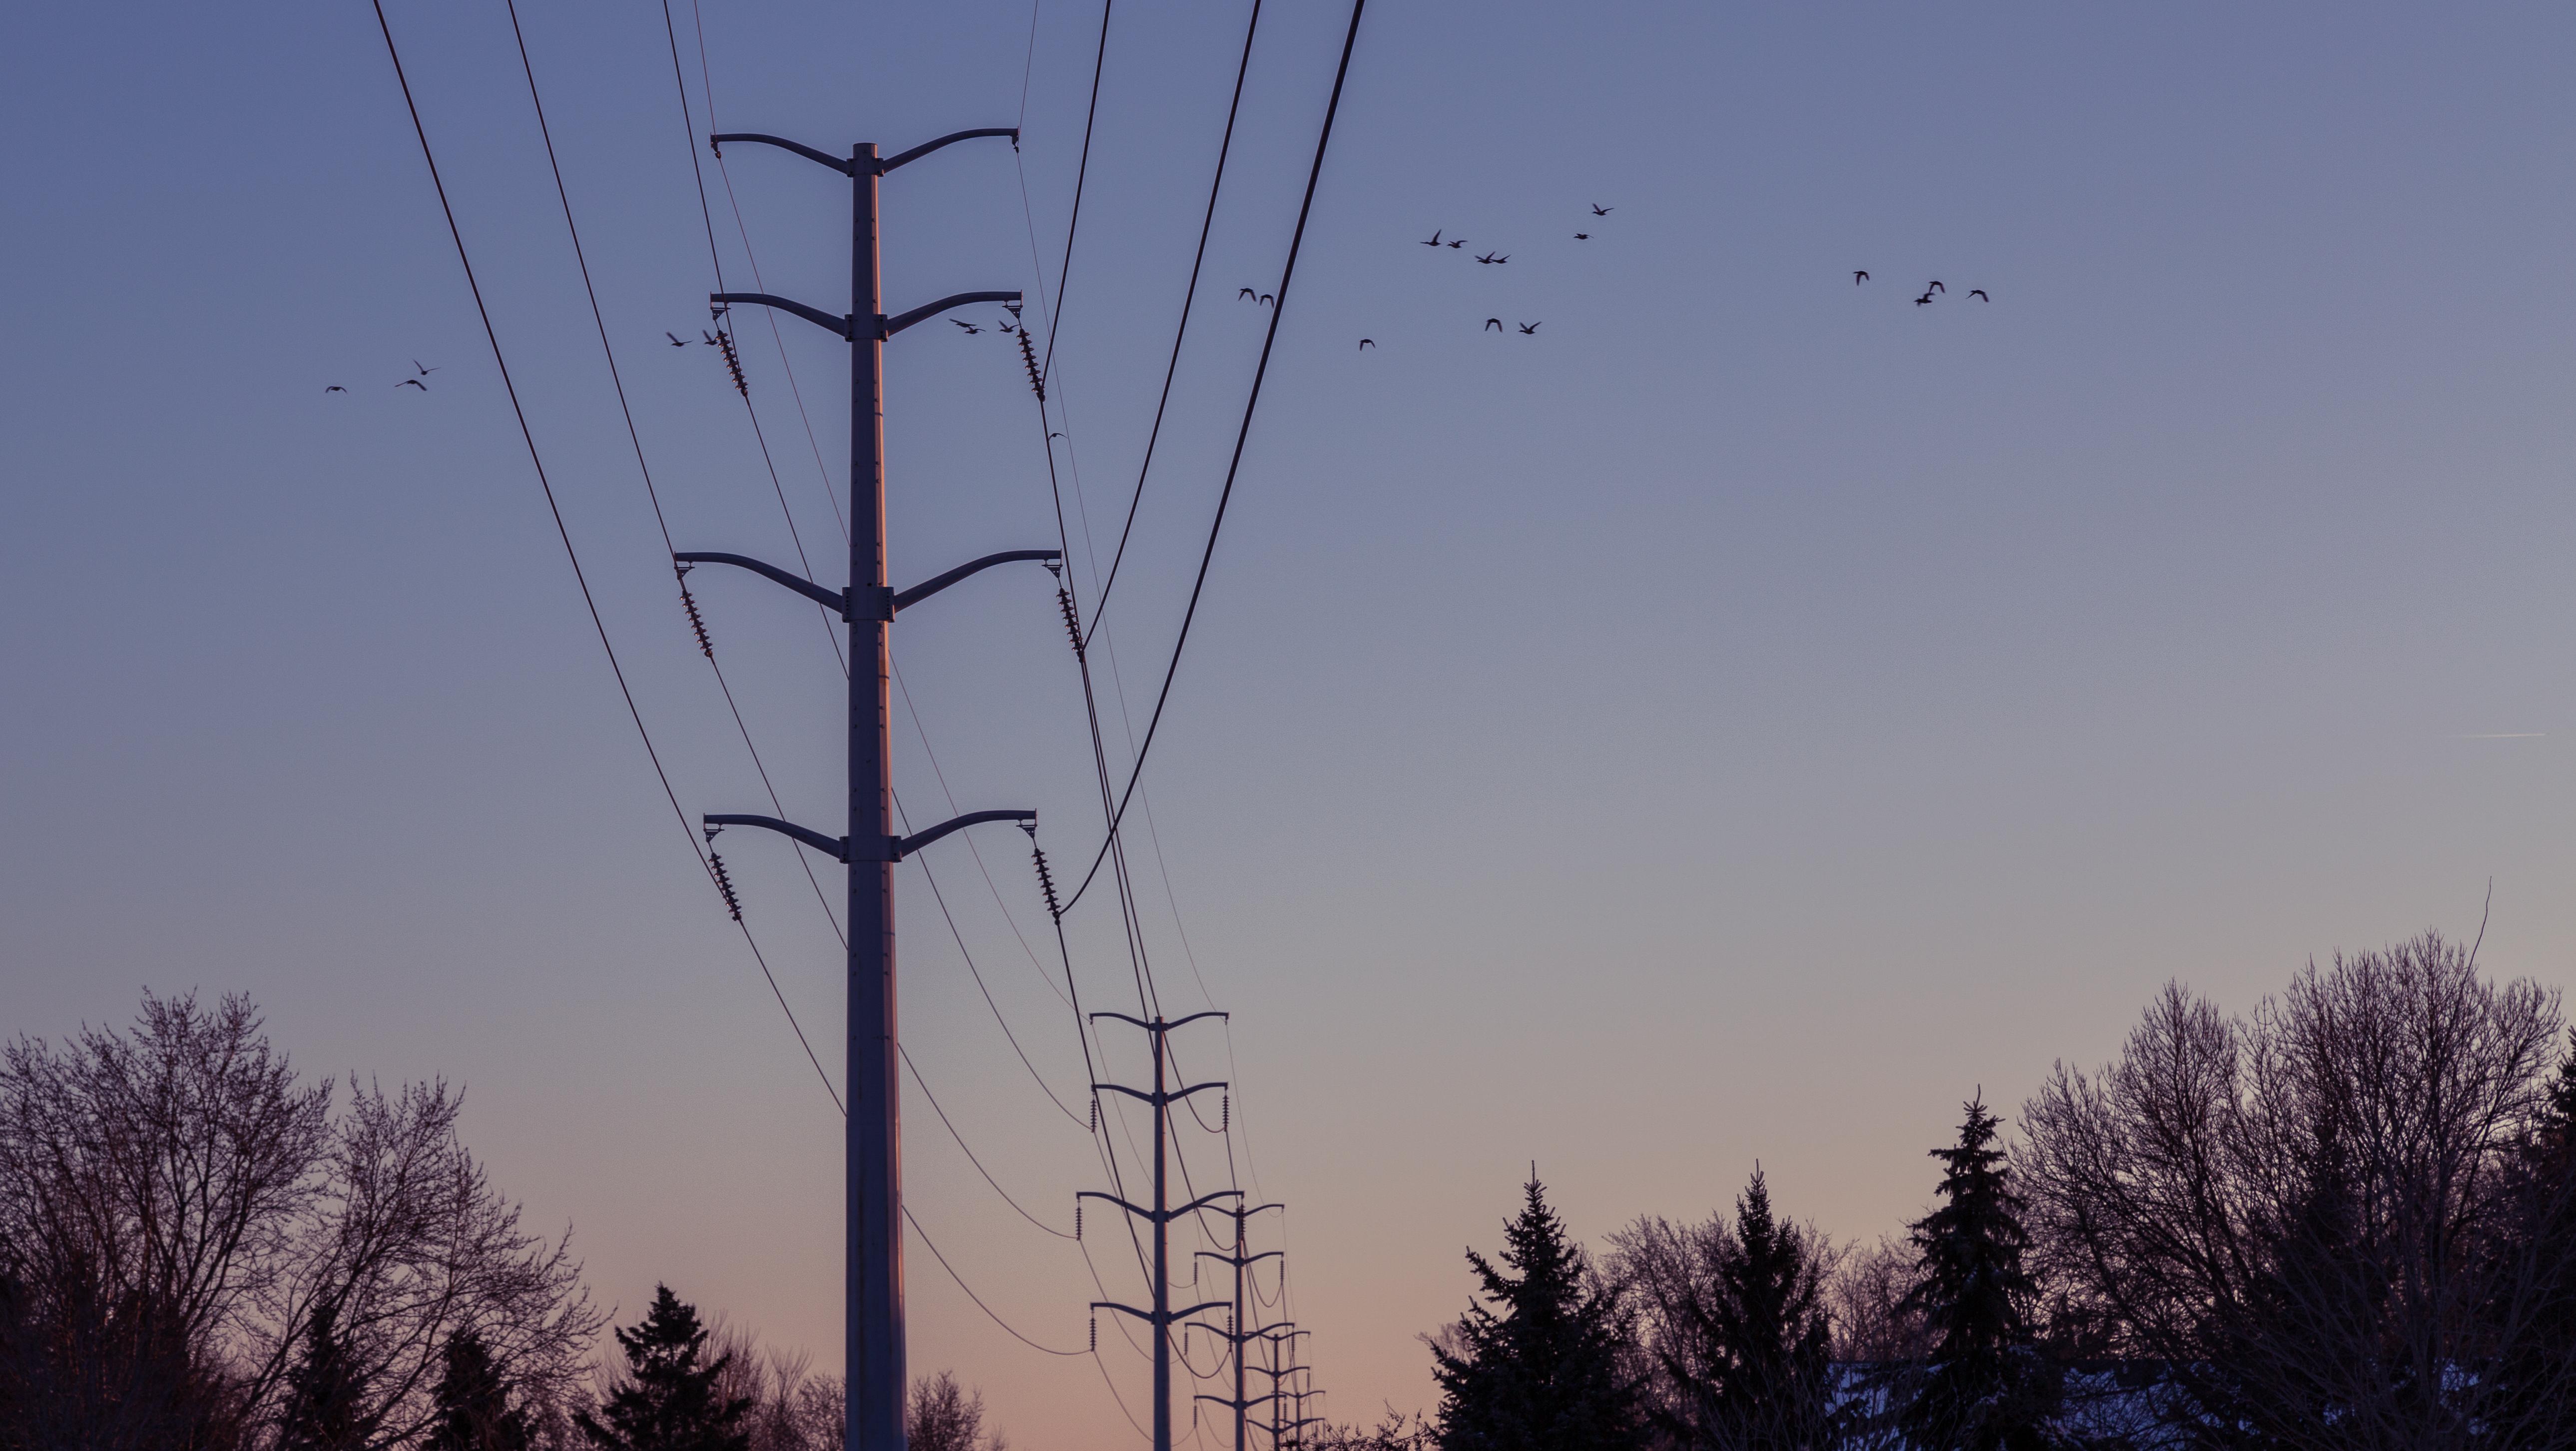 Winter power lines photo